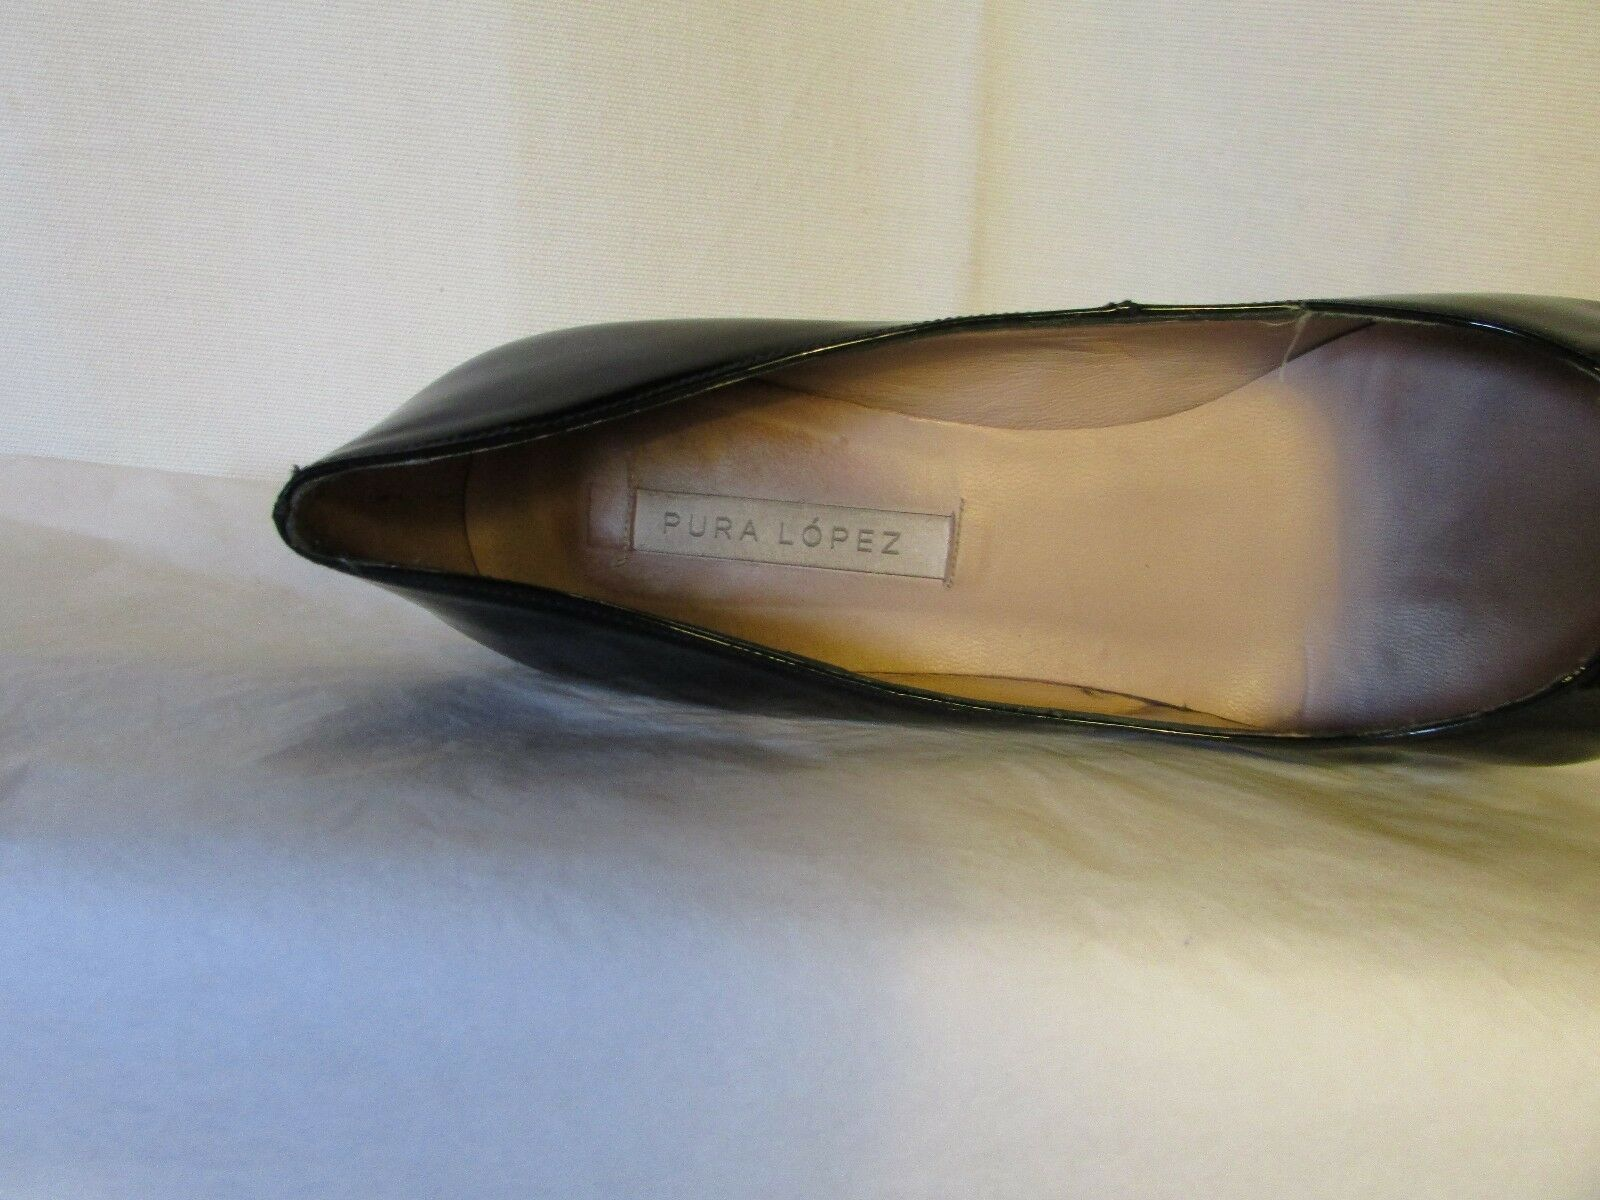 cour cour cour chaussures pura lopez cuirs pine Vert  37,5 2b073d